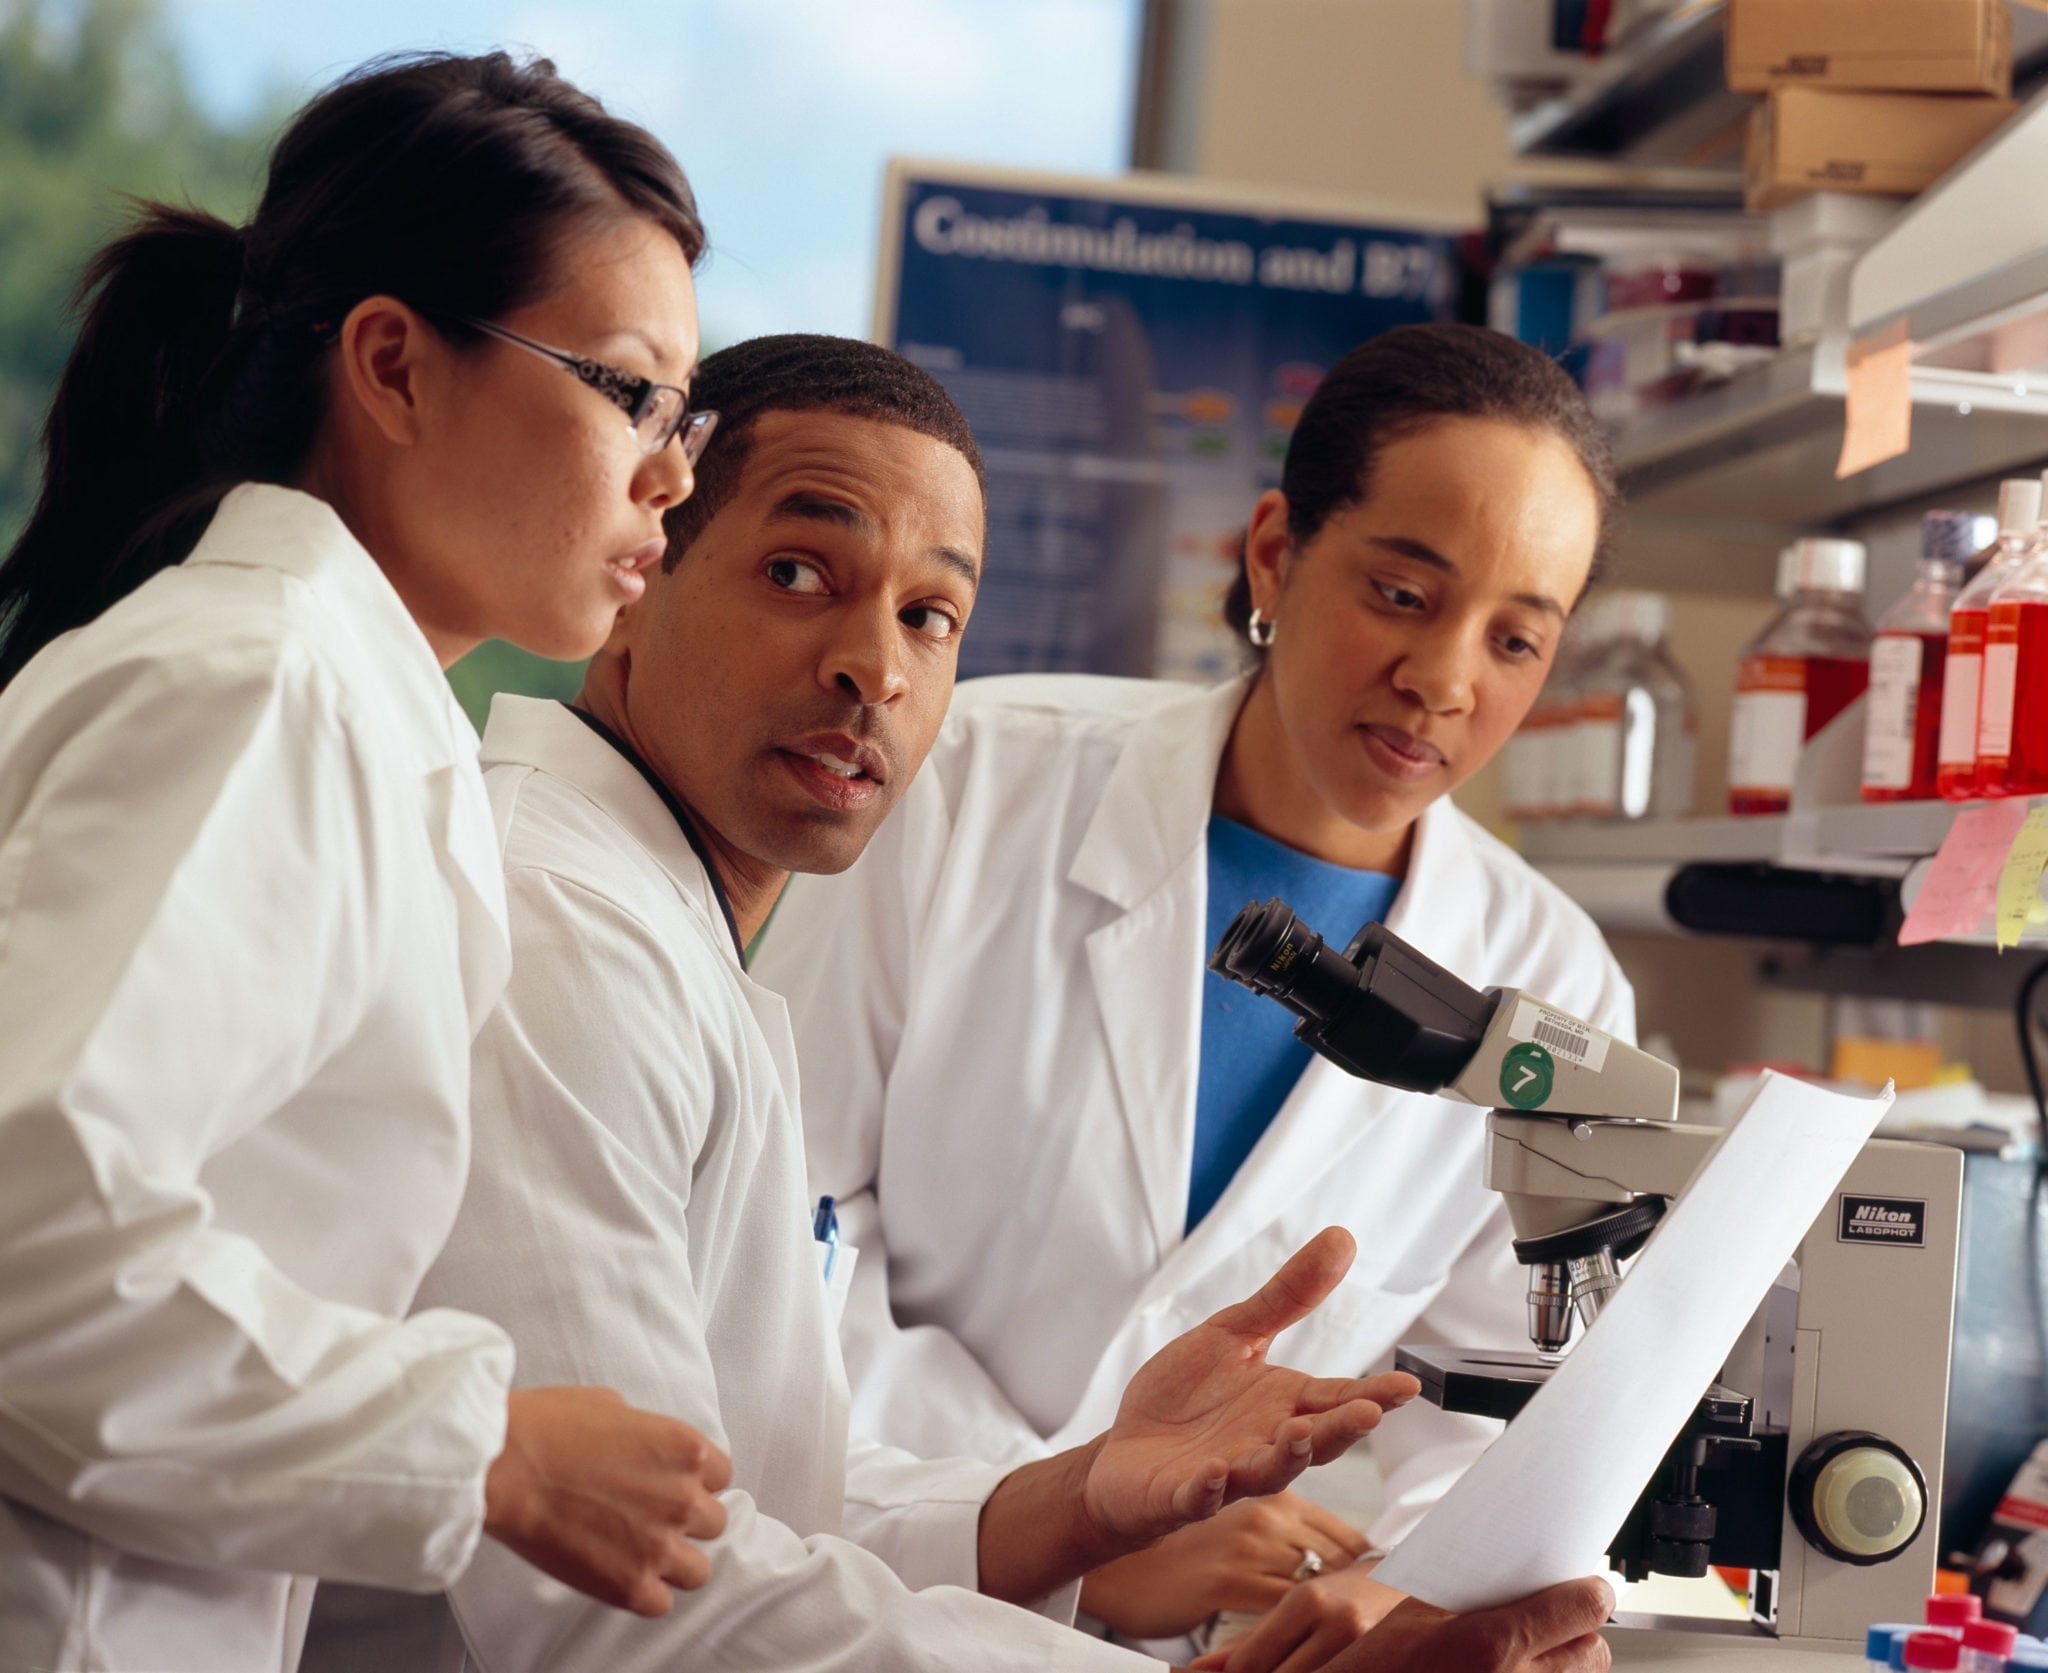 Neurontin Withdrawl Symtoms